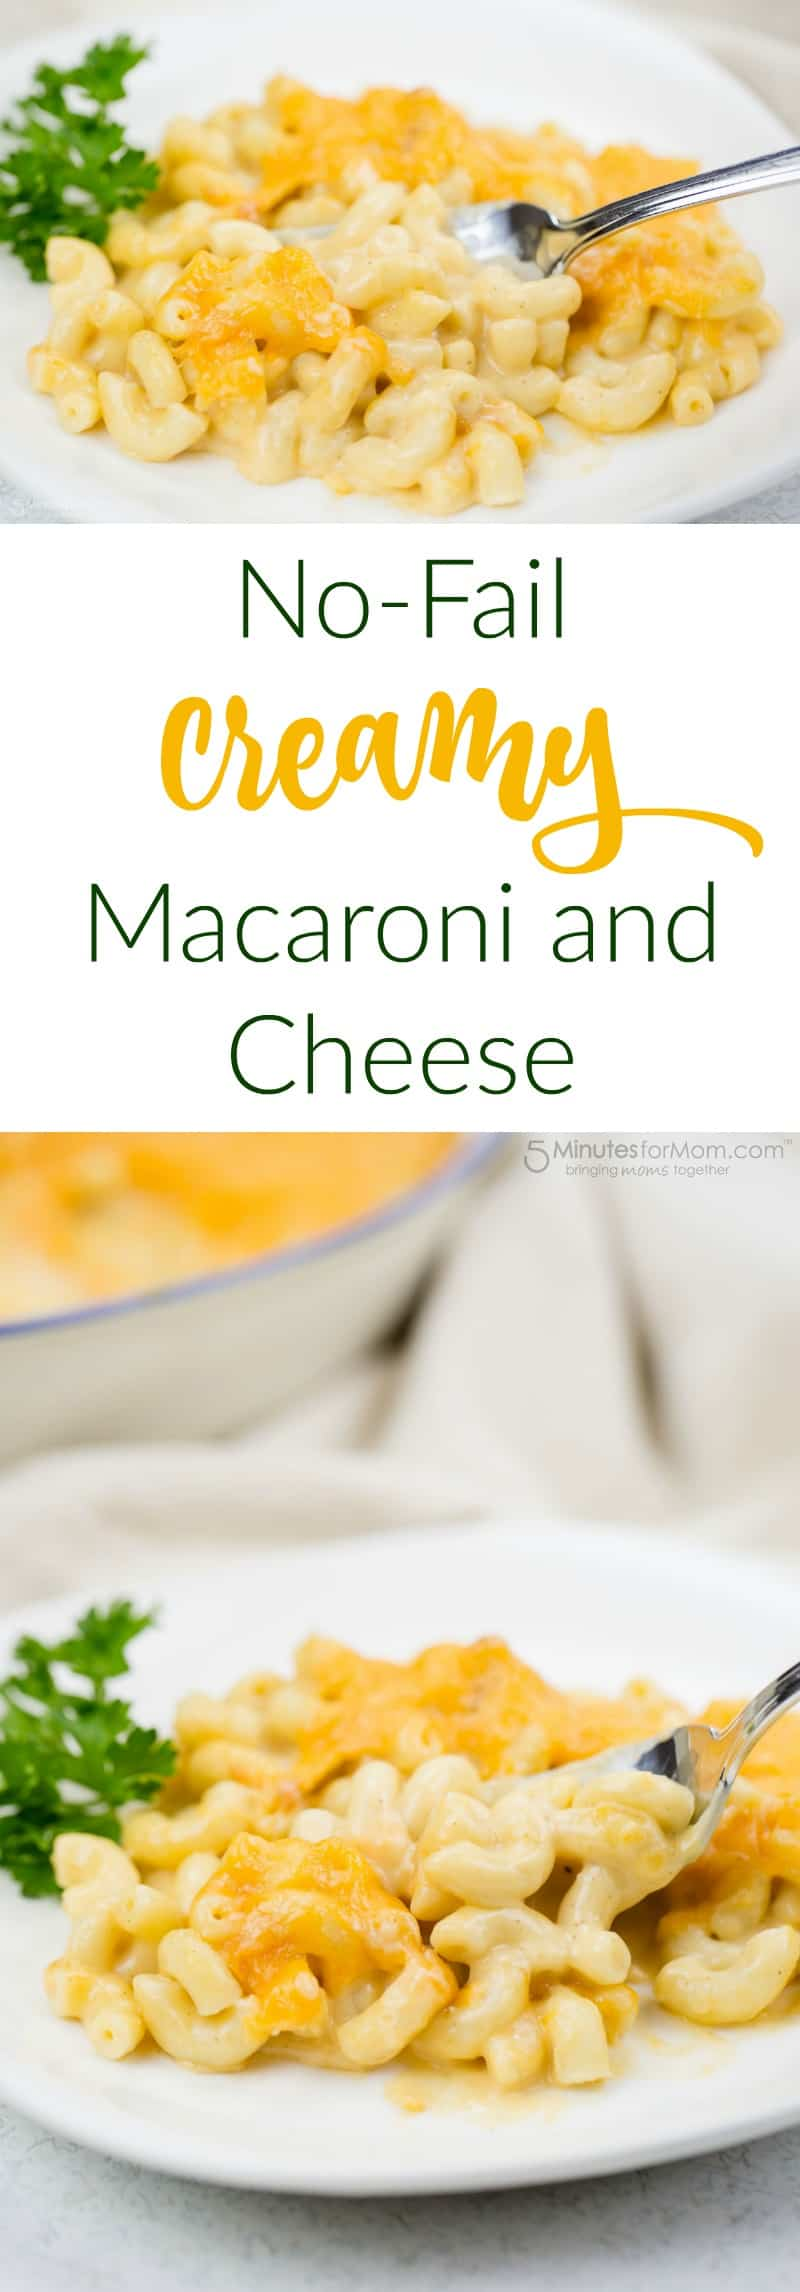 No-Fail Creamy Macaroni and Cheese Recipe